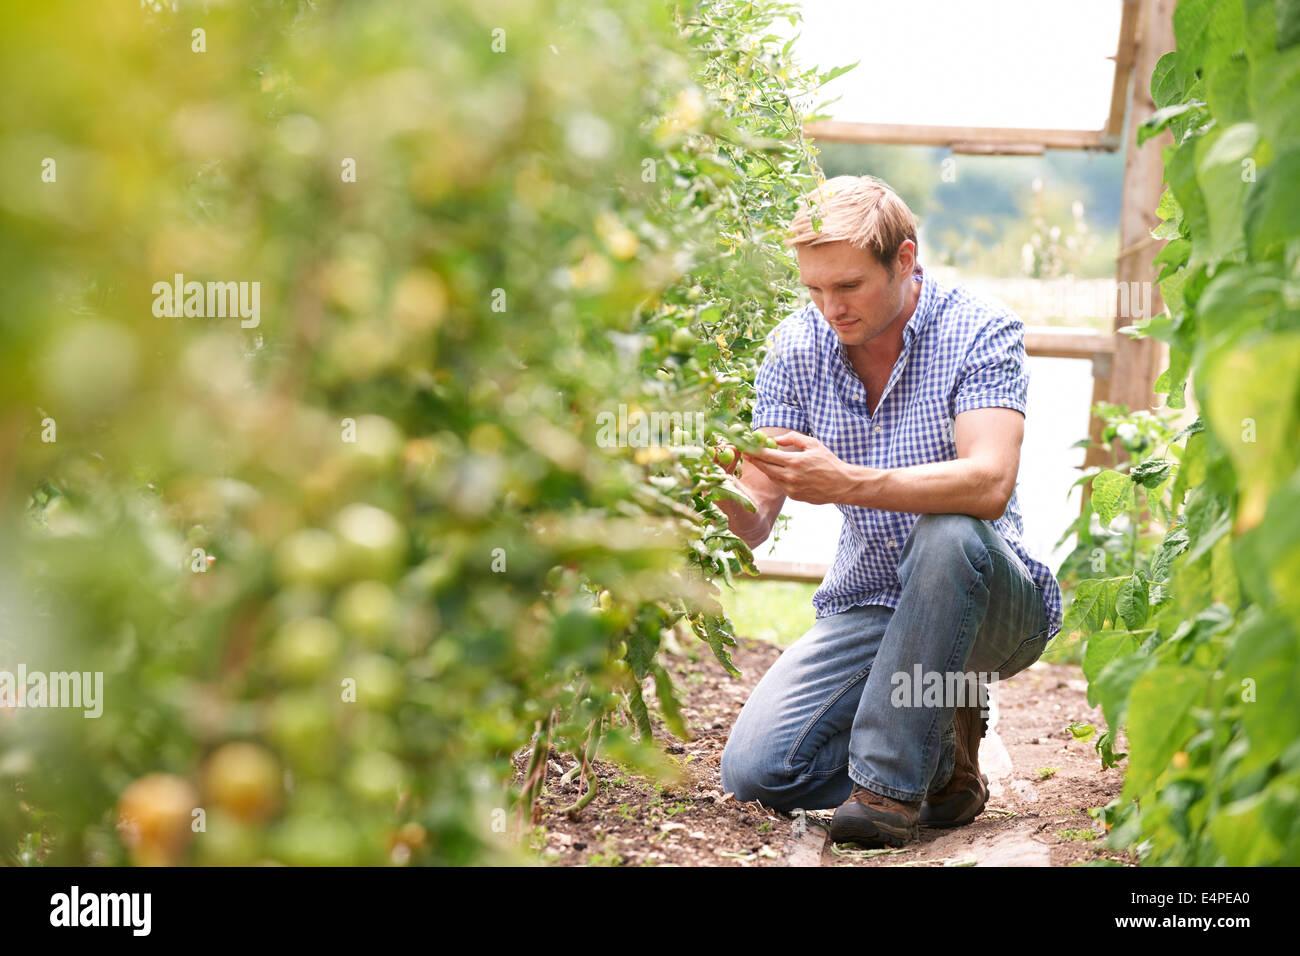 Farmer Checking Tomato Plants In Greenhouse - Stock Image